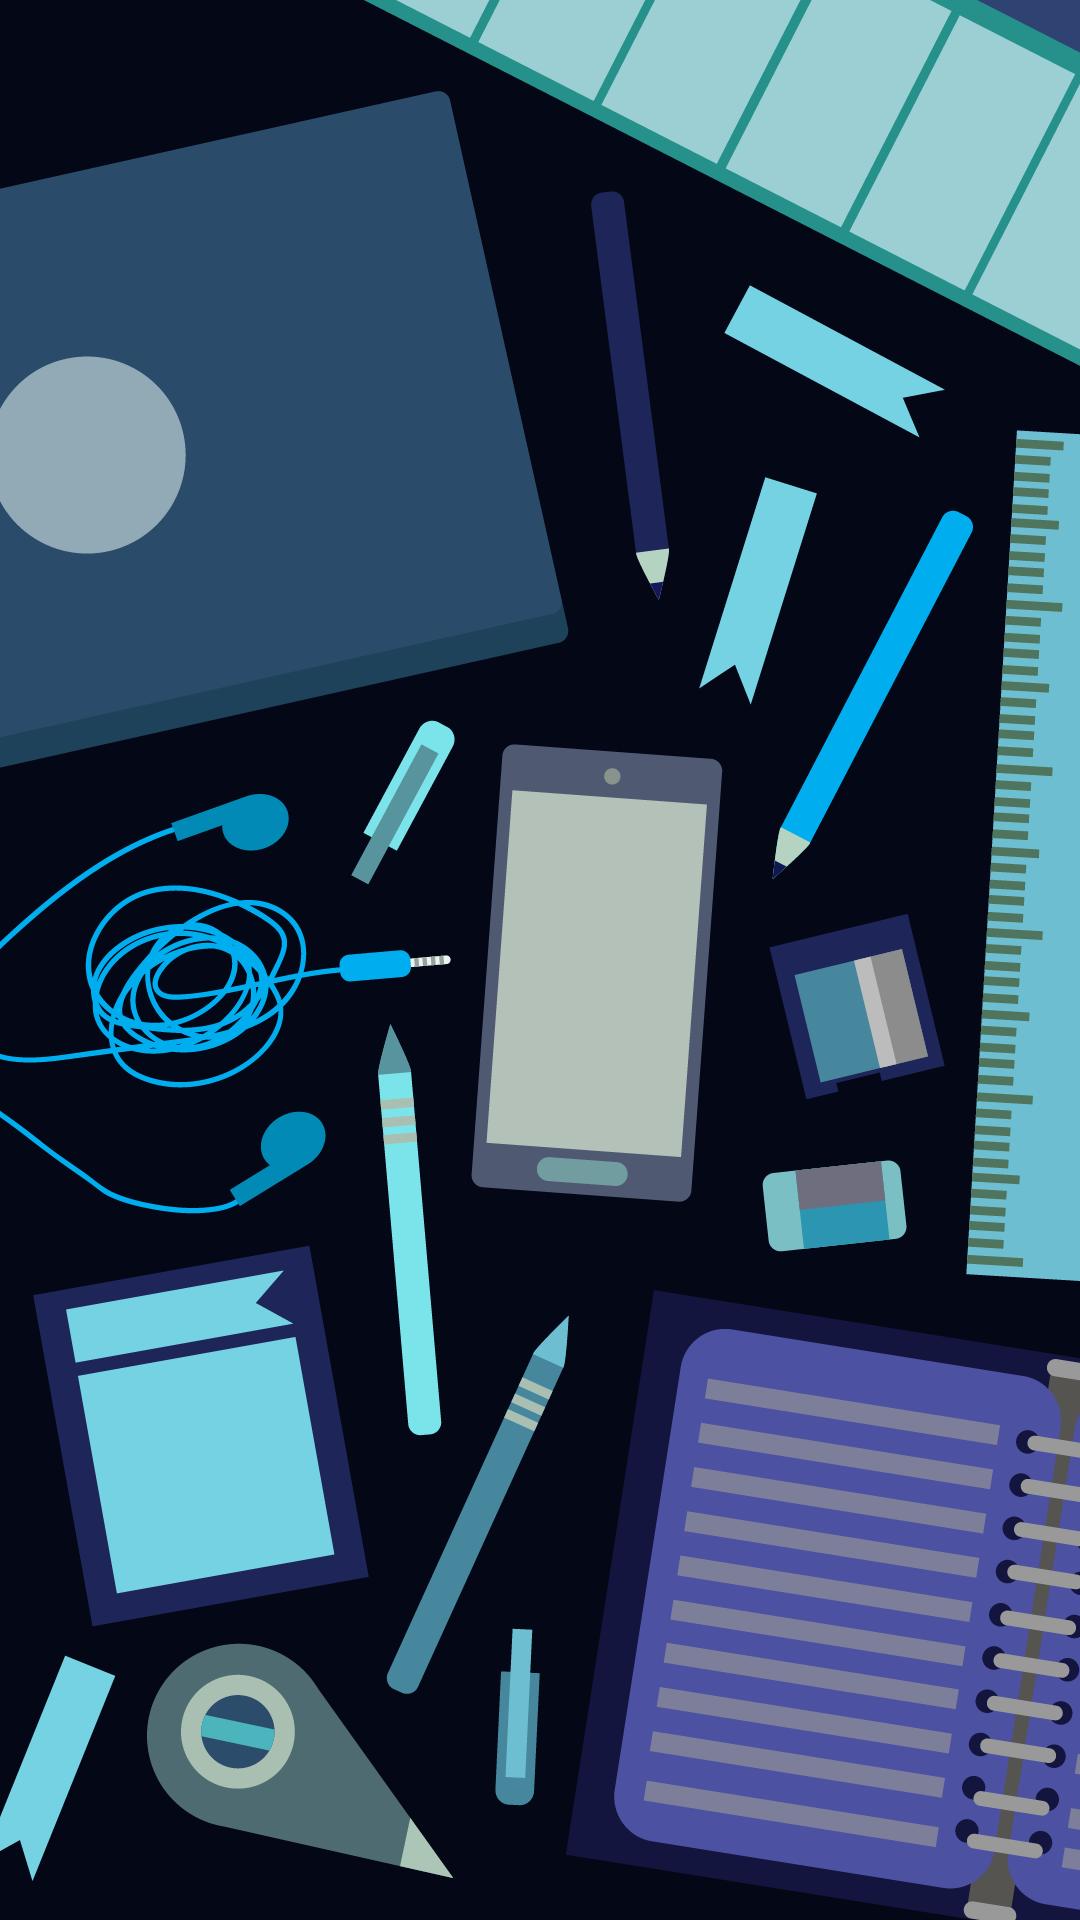 Stationery Blue Sekolah Lucu Belajar Latar Belakang Animasi